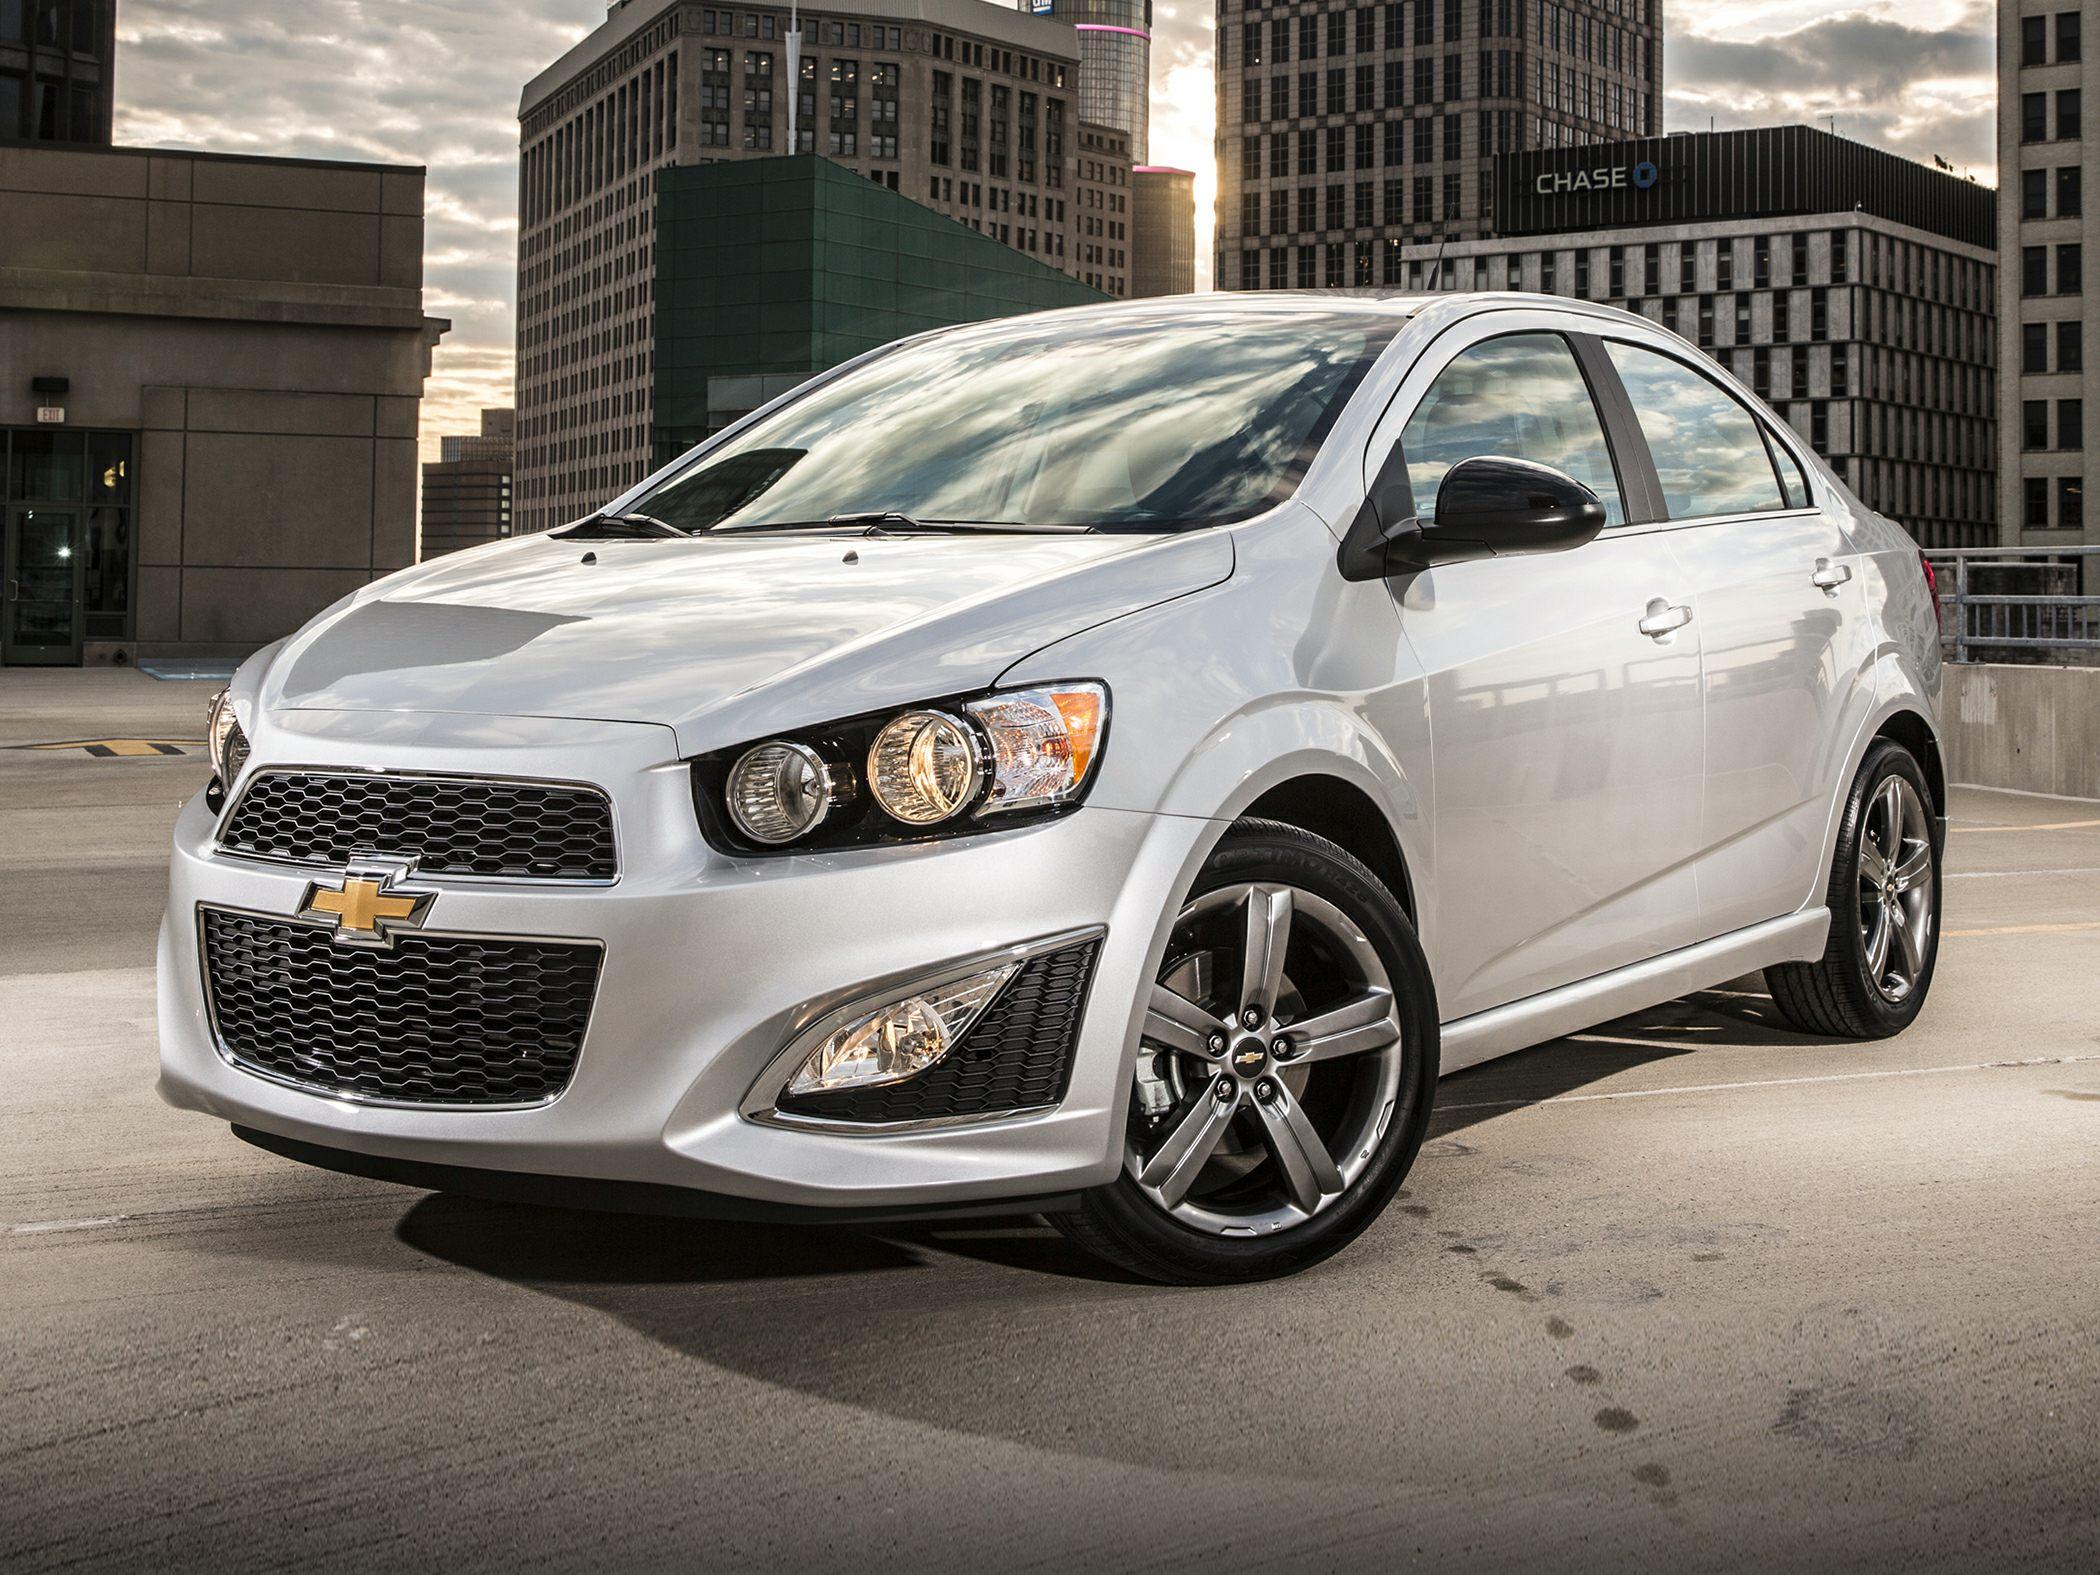 2014 Chevrolet Sonic Glam